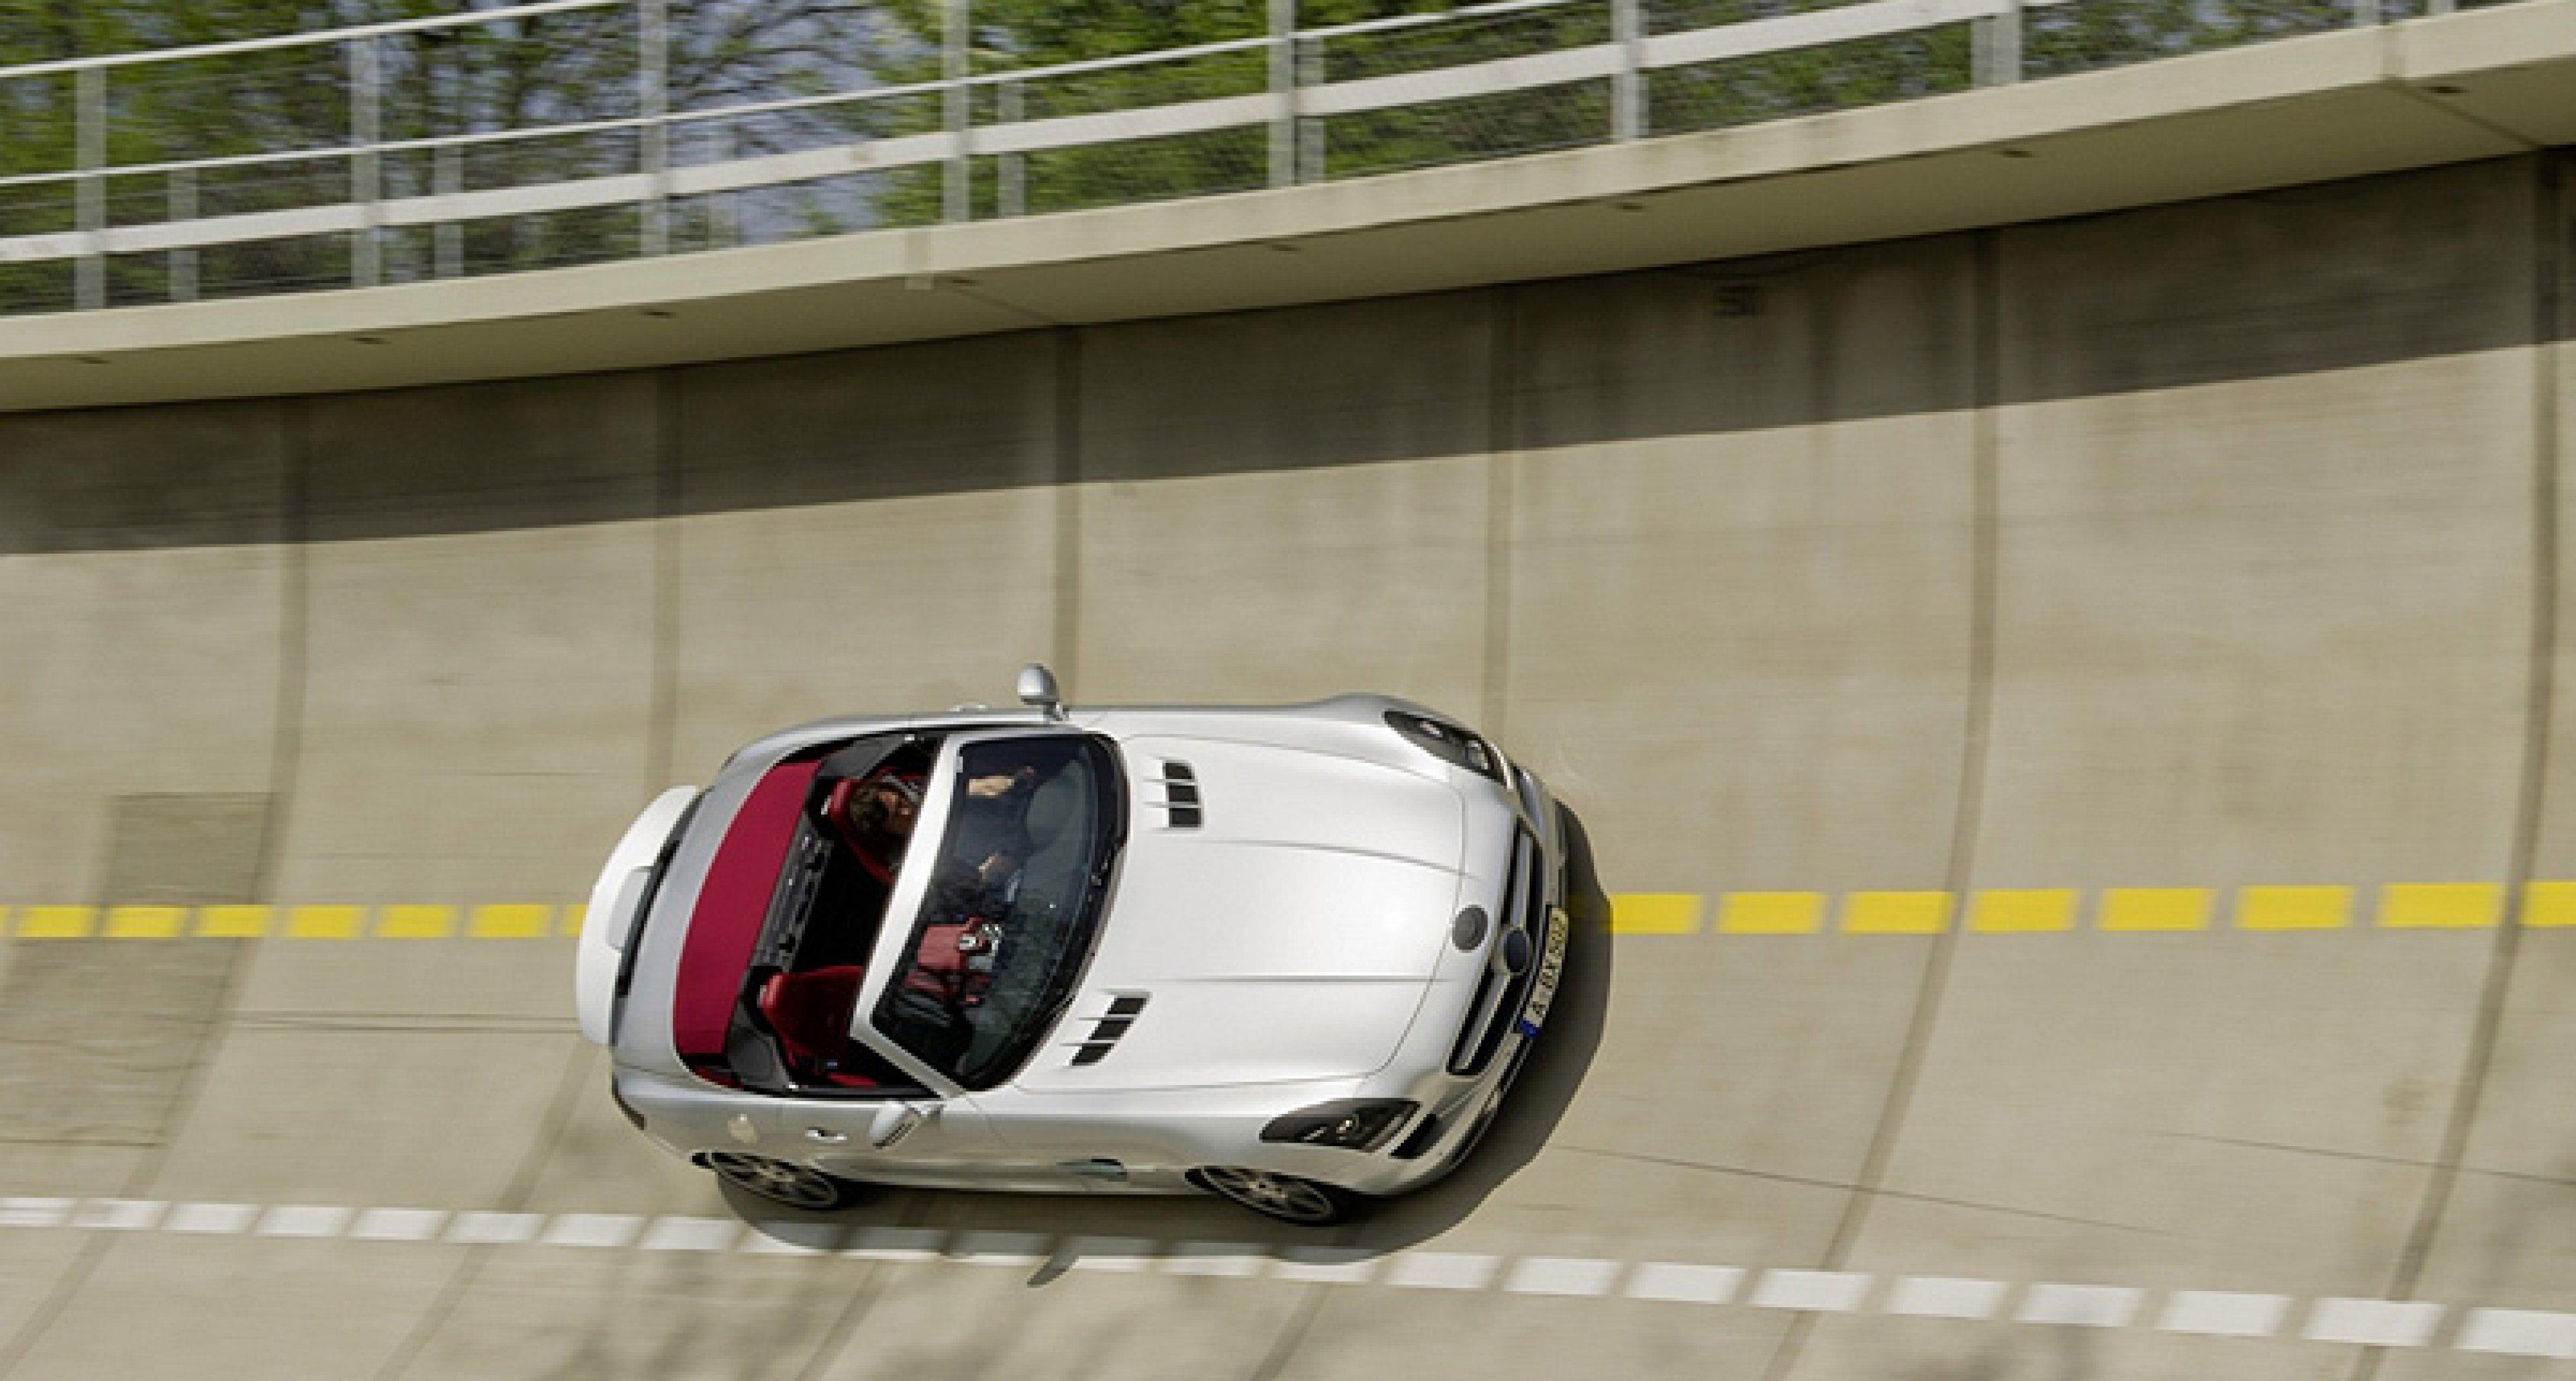 Mercedes SLS AMG Roadster: Alles andere als flügellahm